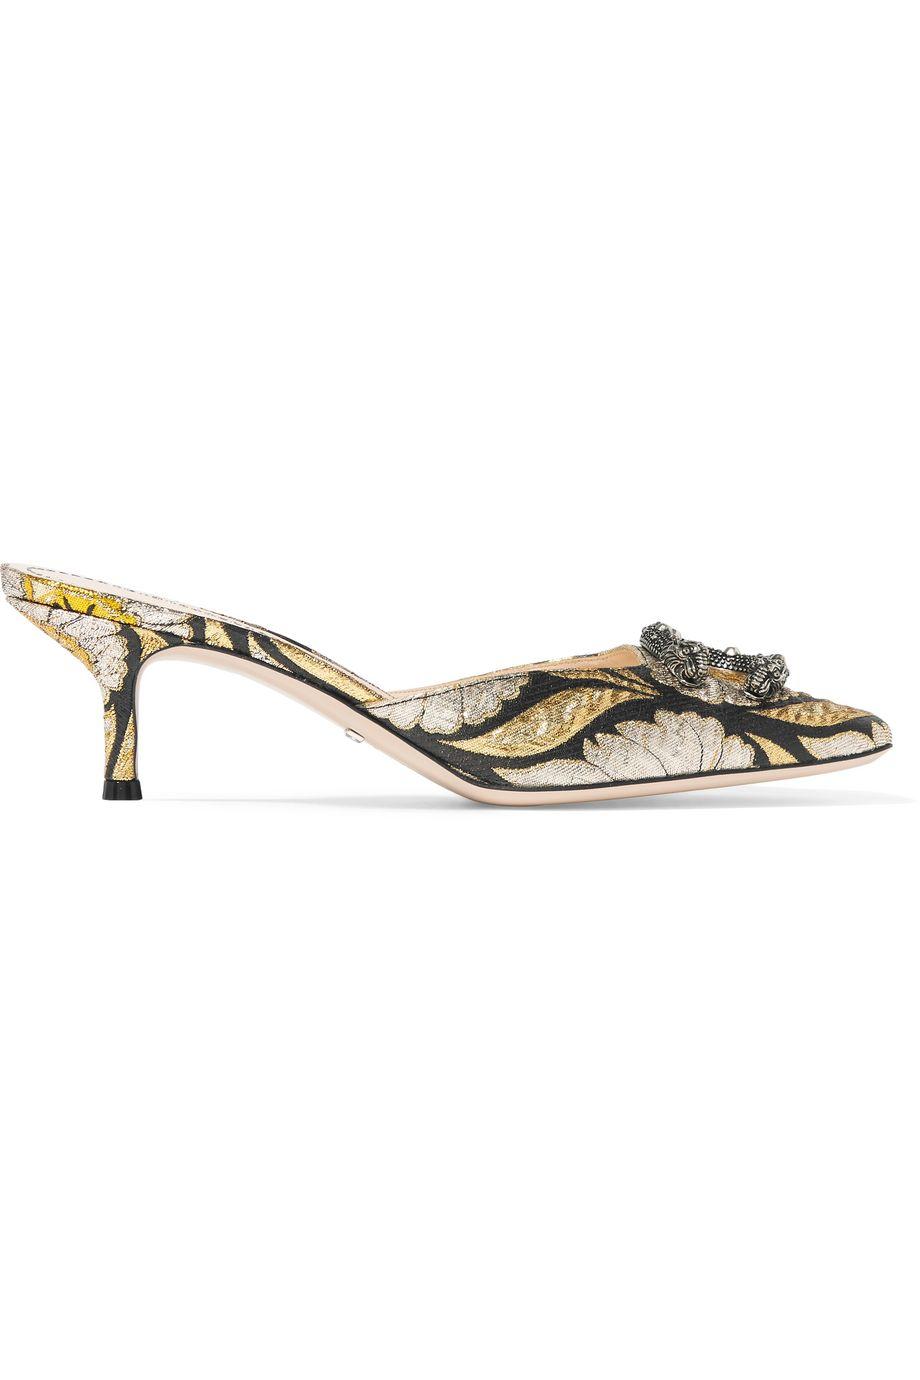 Gucci Embellished jacquard mules